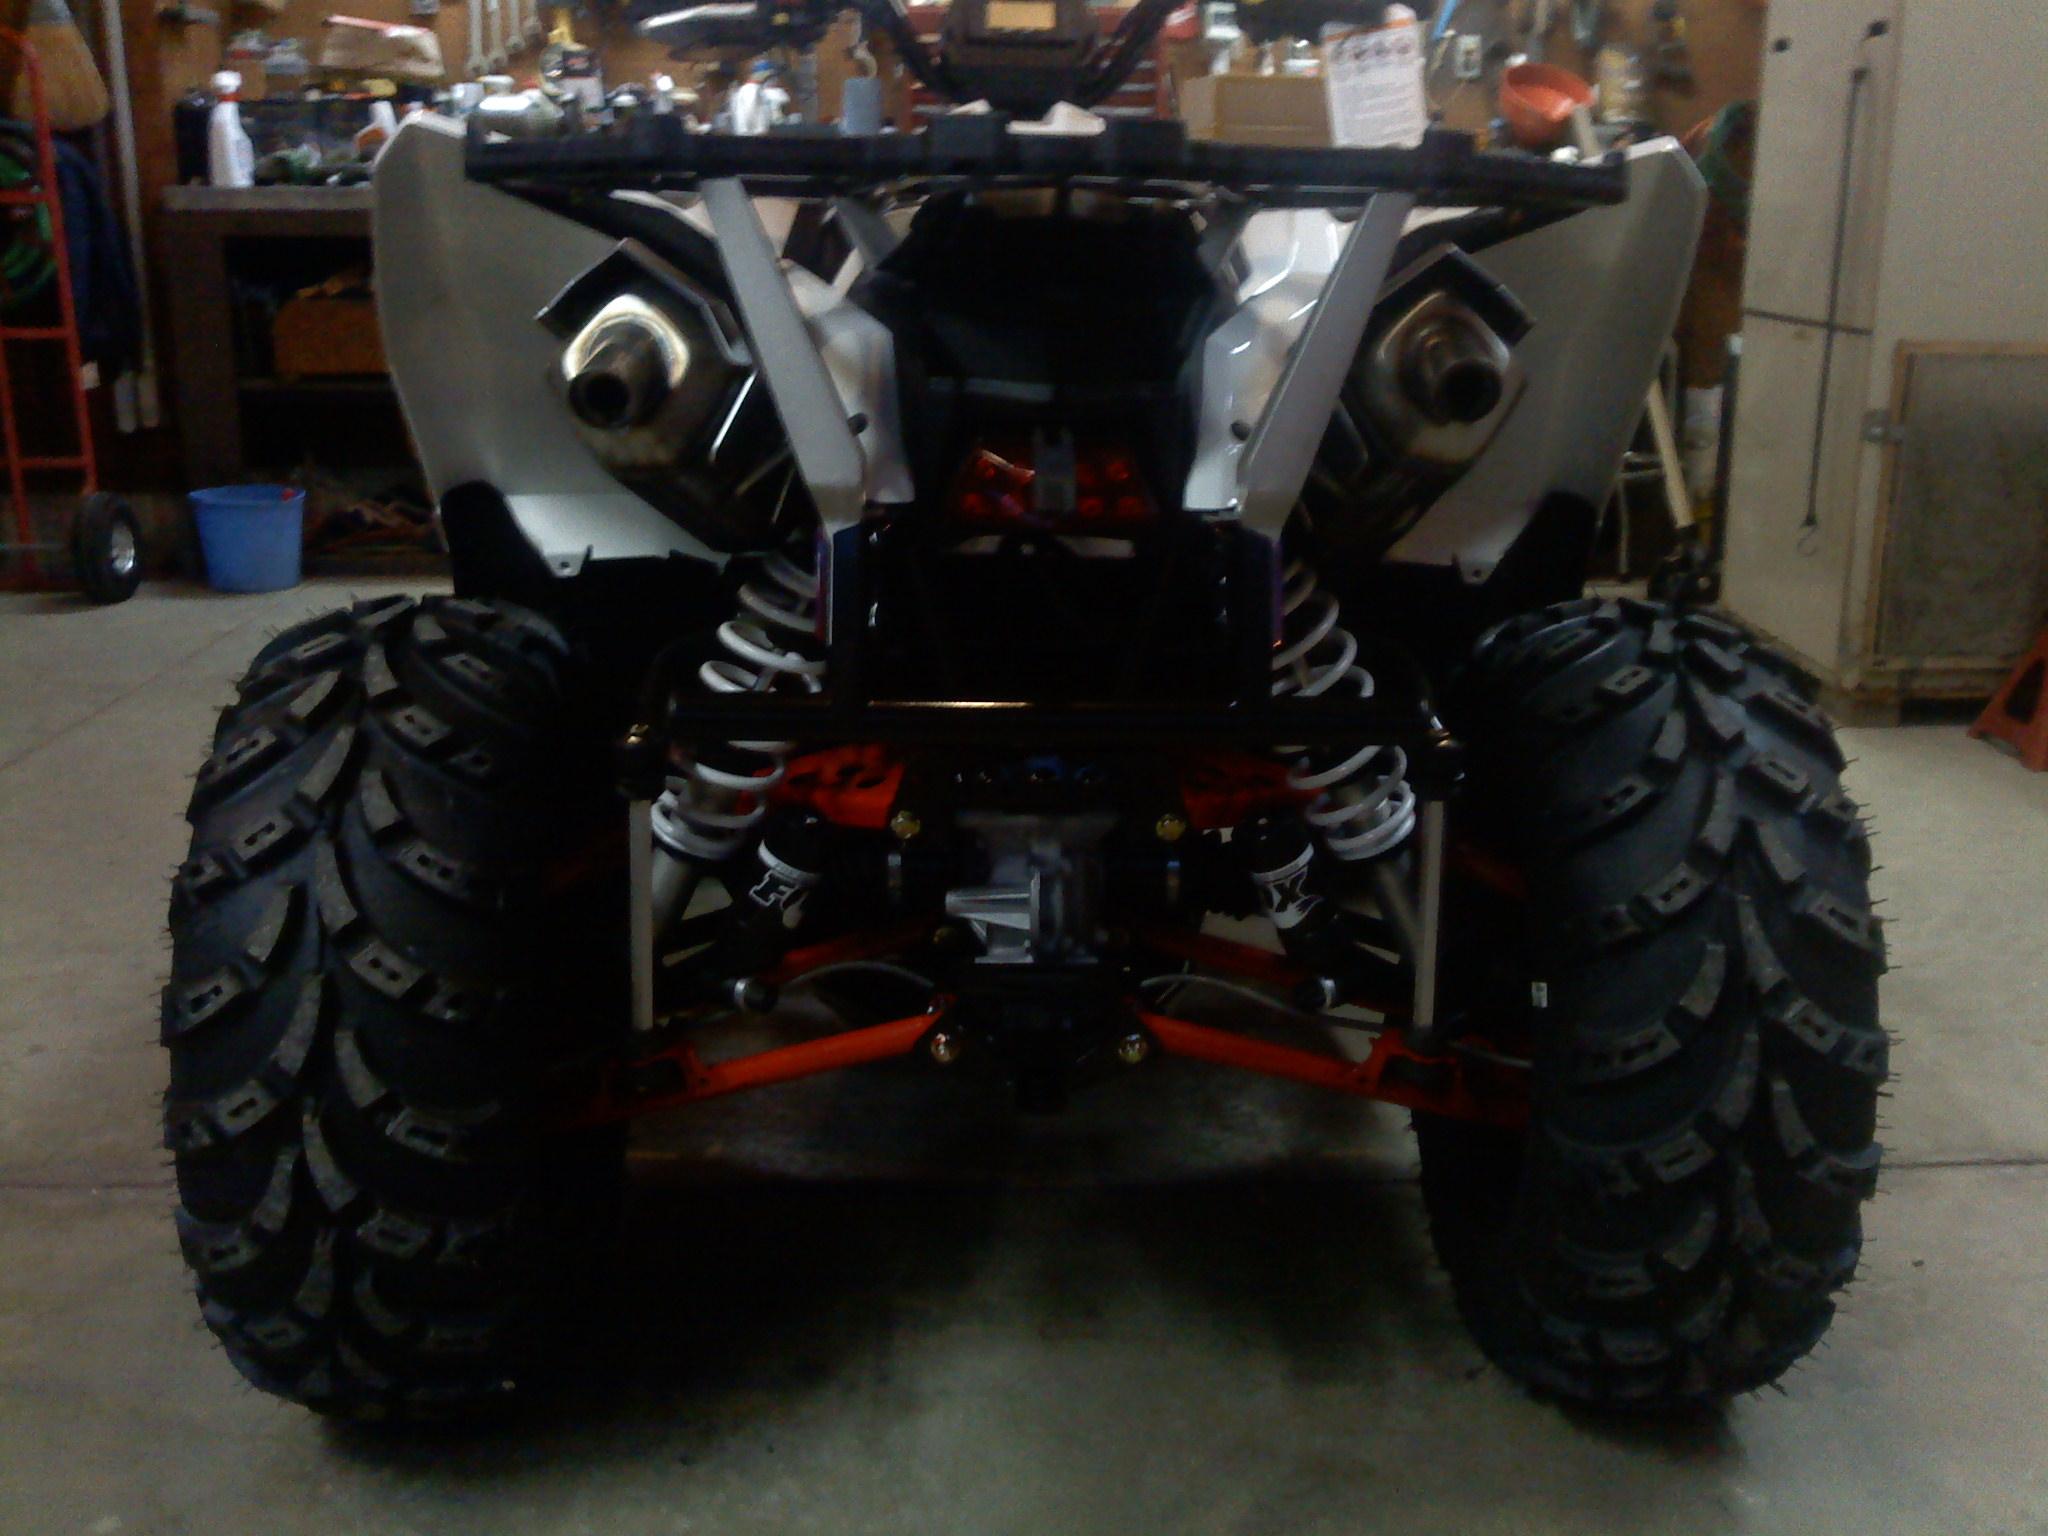 Polaris Outlaw 525 >> My 1000 has finally arrived! - Polaris ATV Forum